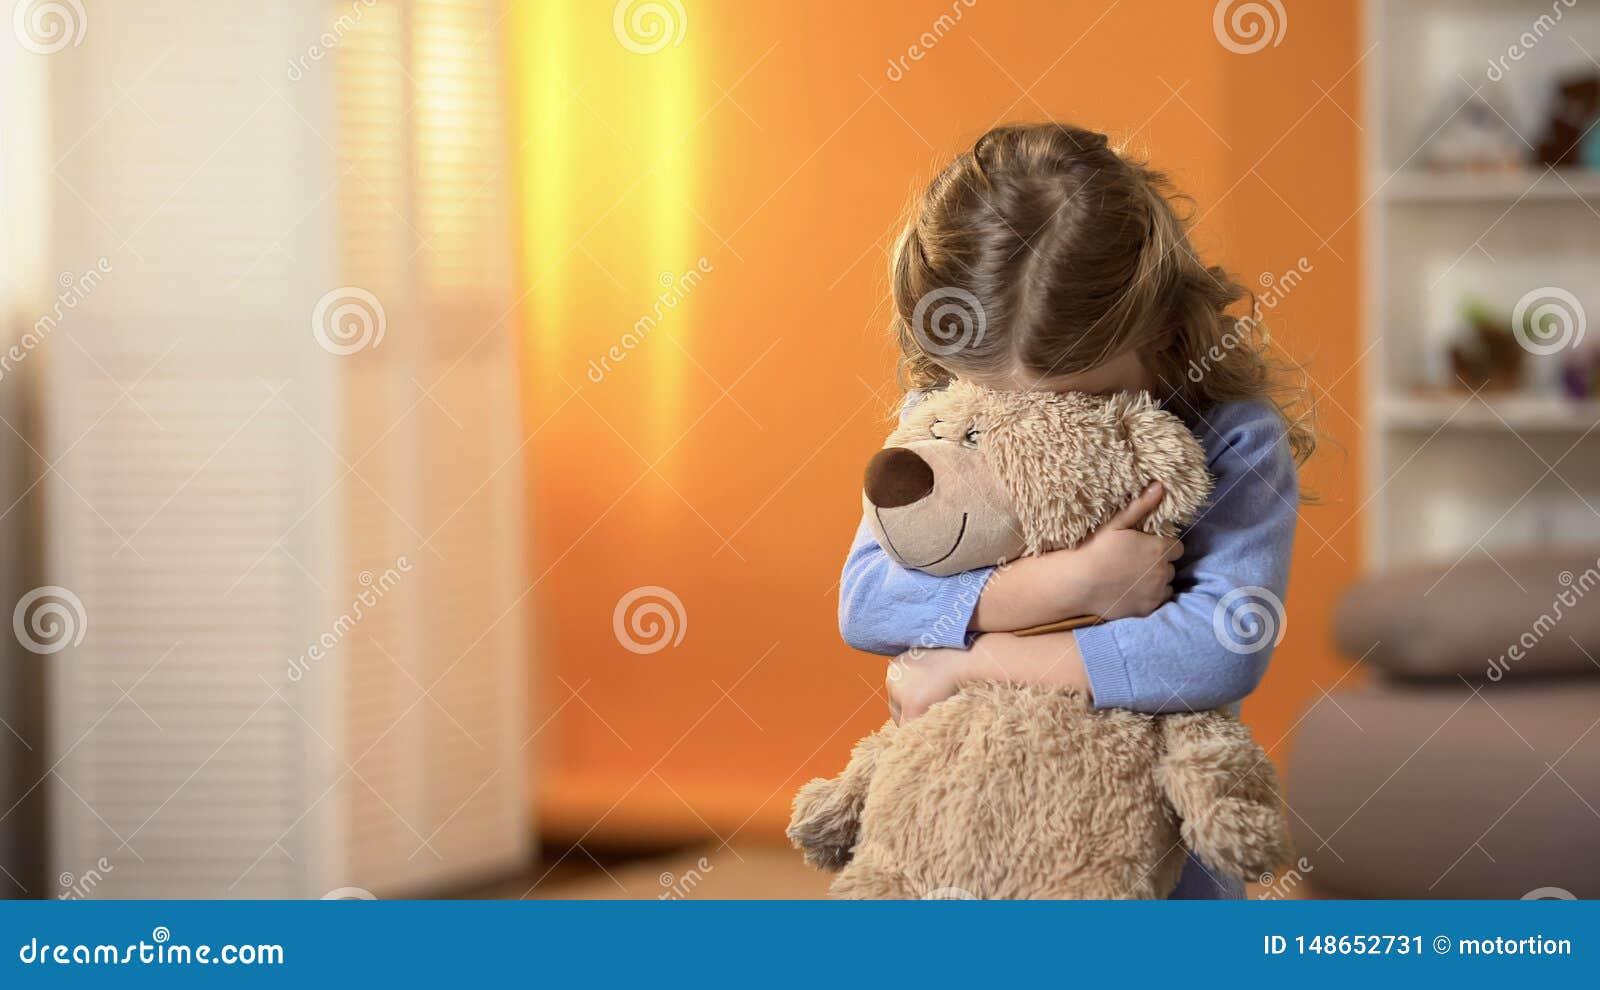 Schuw krullend meisjes verbergend gezicht achter favoriete teddybeer, kinderjarenpsychologie